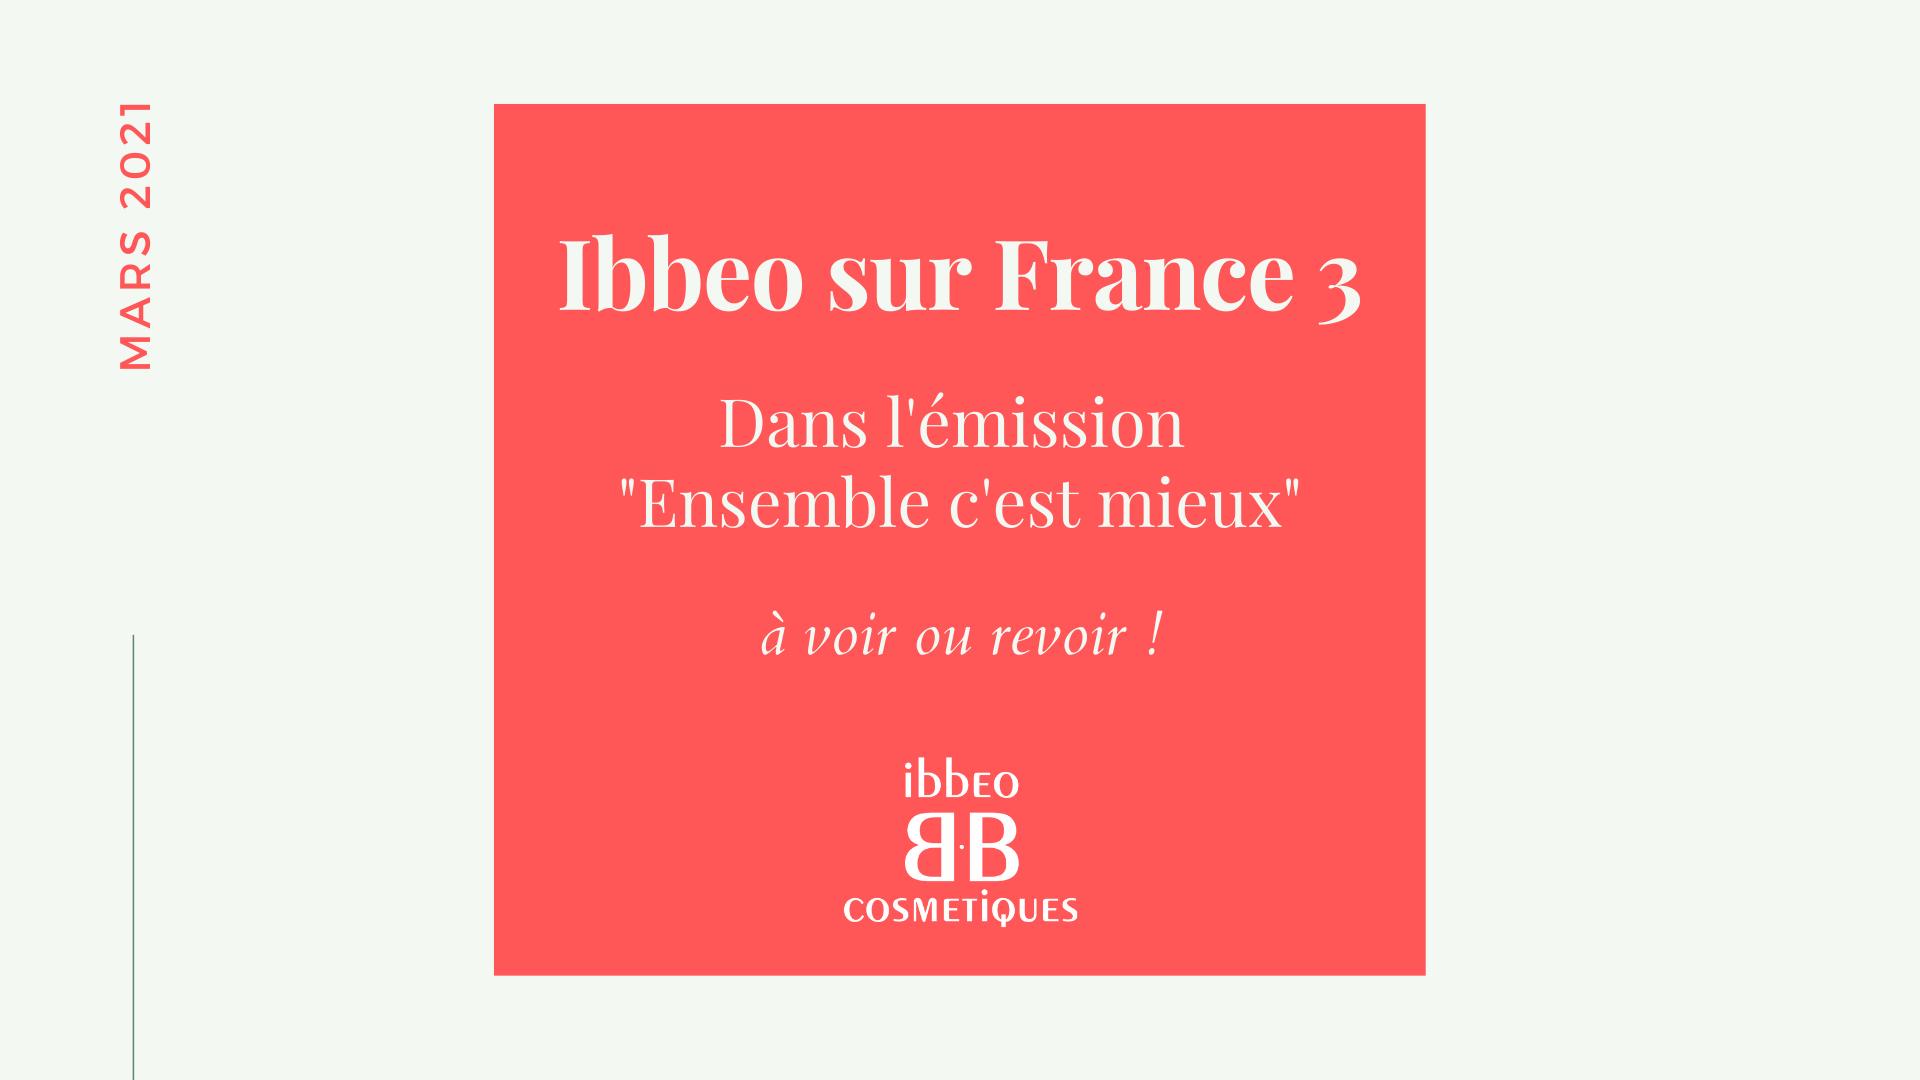 Ibbeo sur france 3